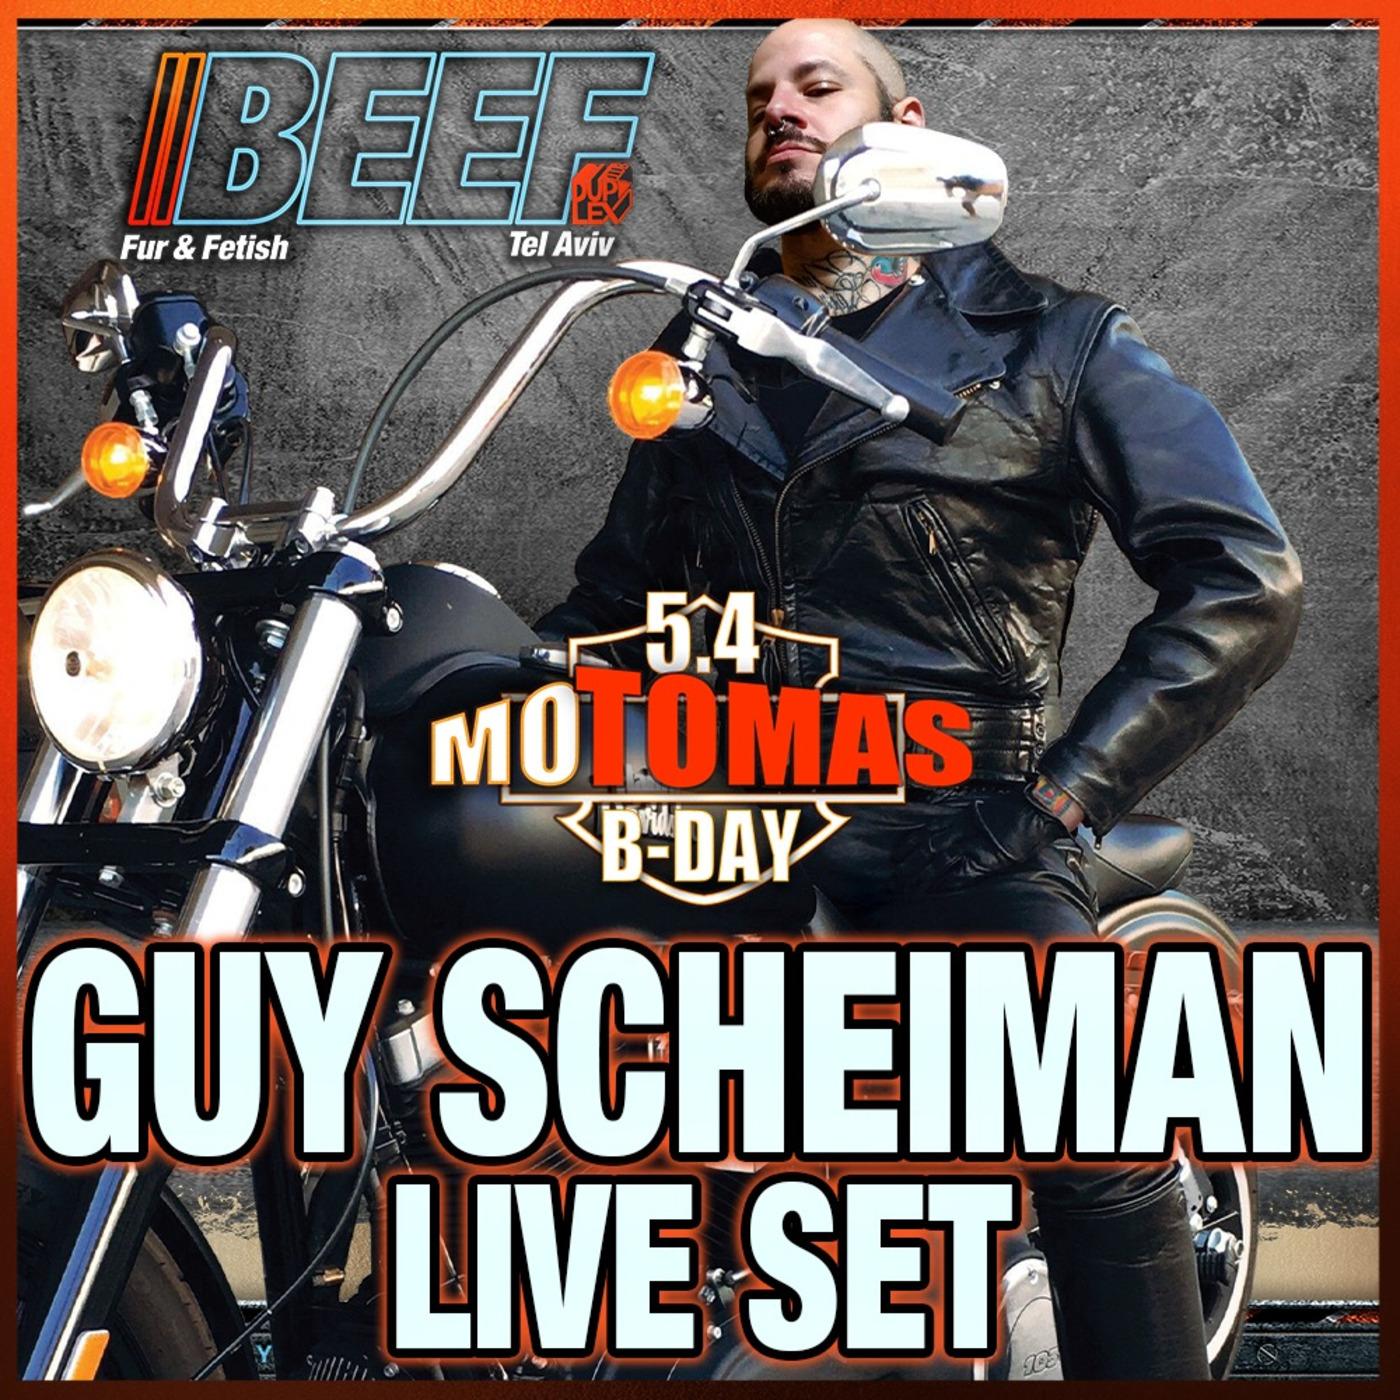 MoTomas Beef Tel - Aviv Guy Scheiman Live Mix April 5th 2019